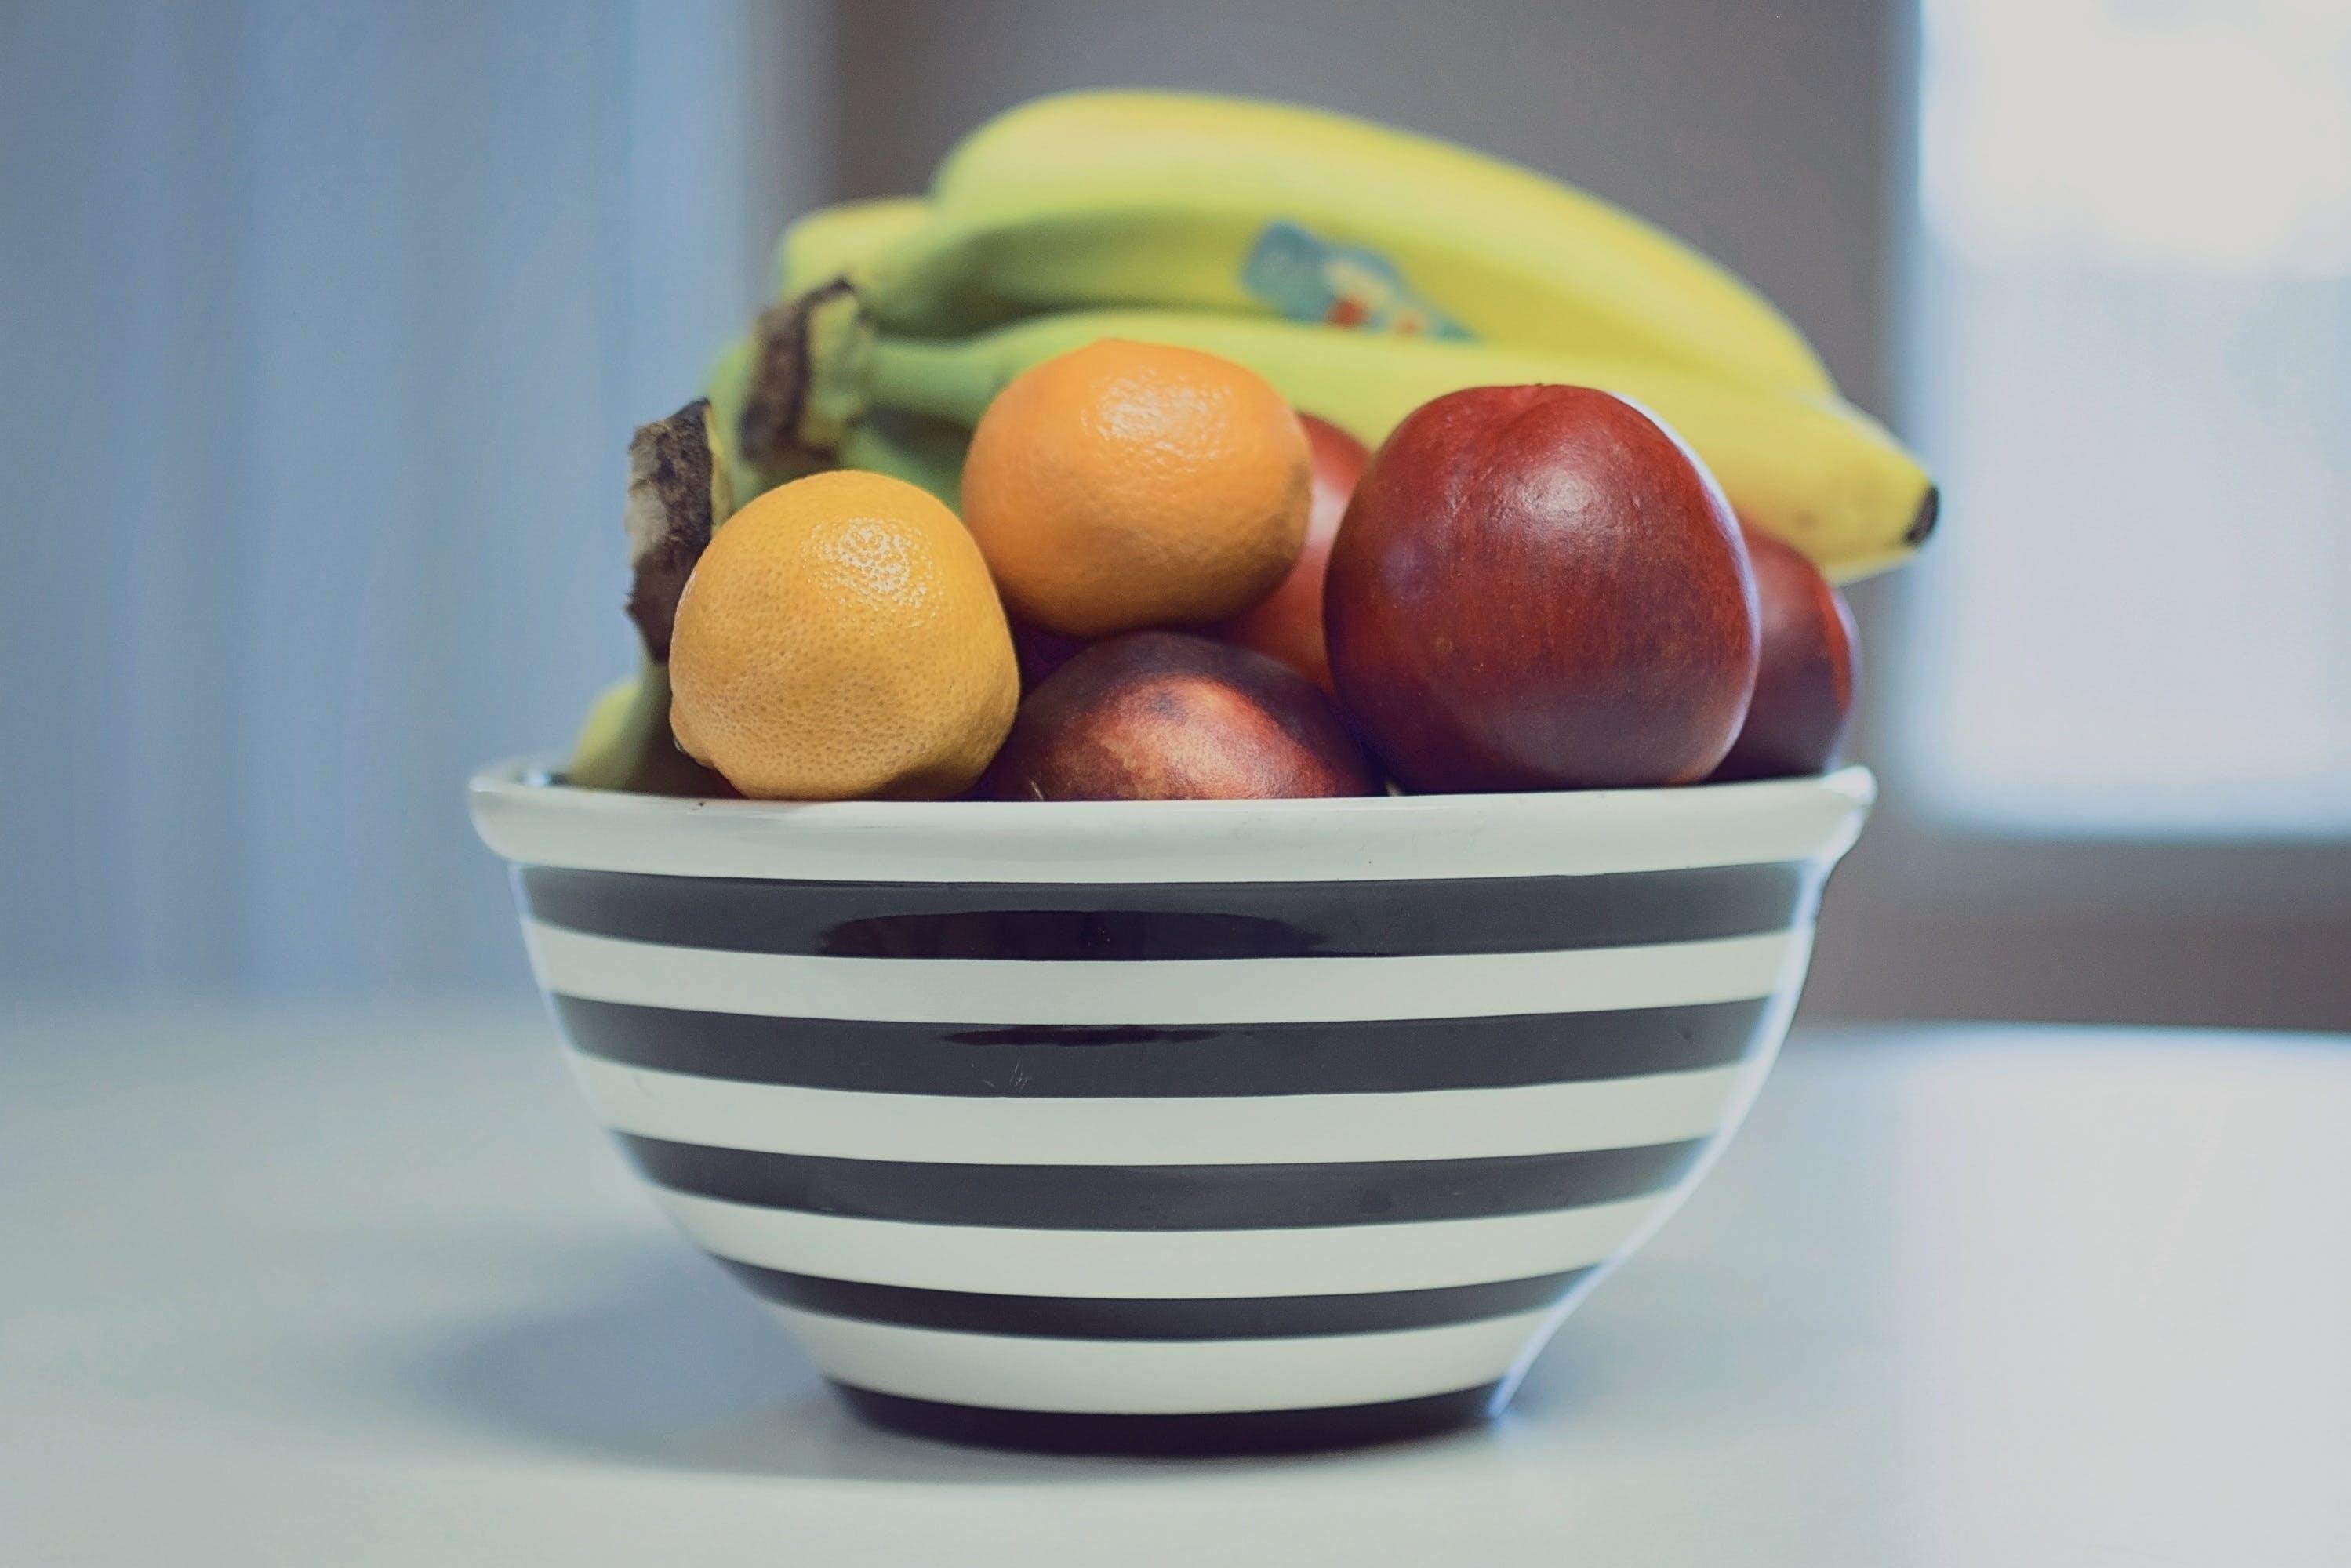 Kostenloses Stock Foto zu äpfel, bananen, bunt, diät